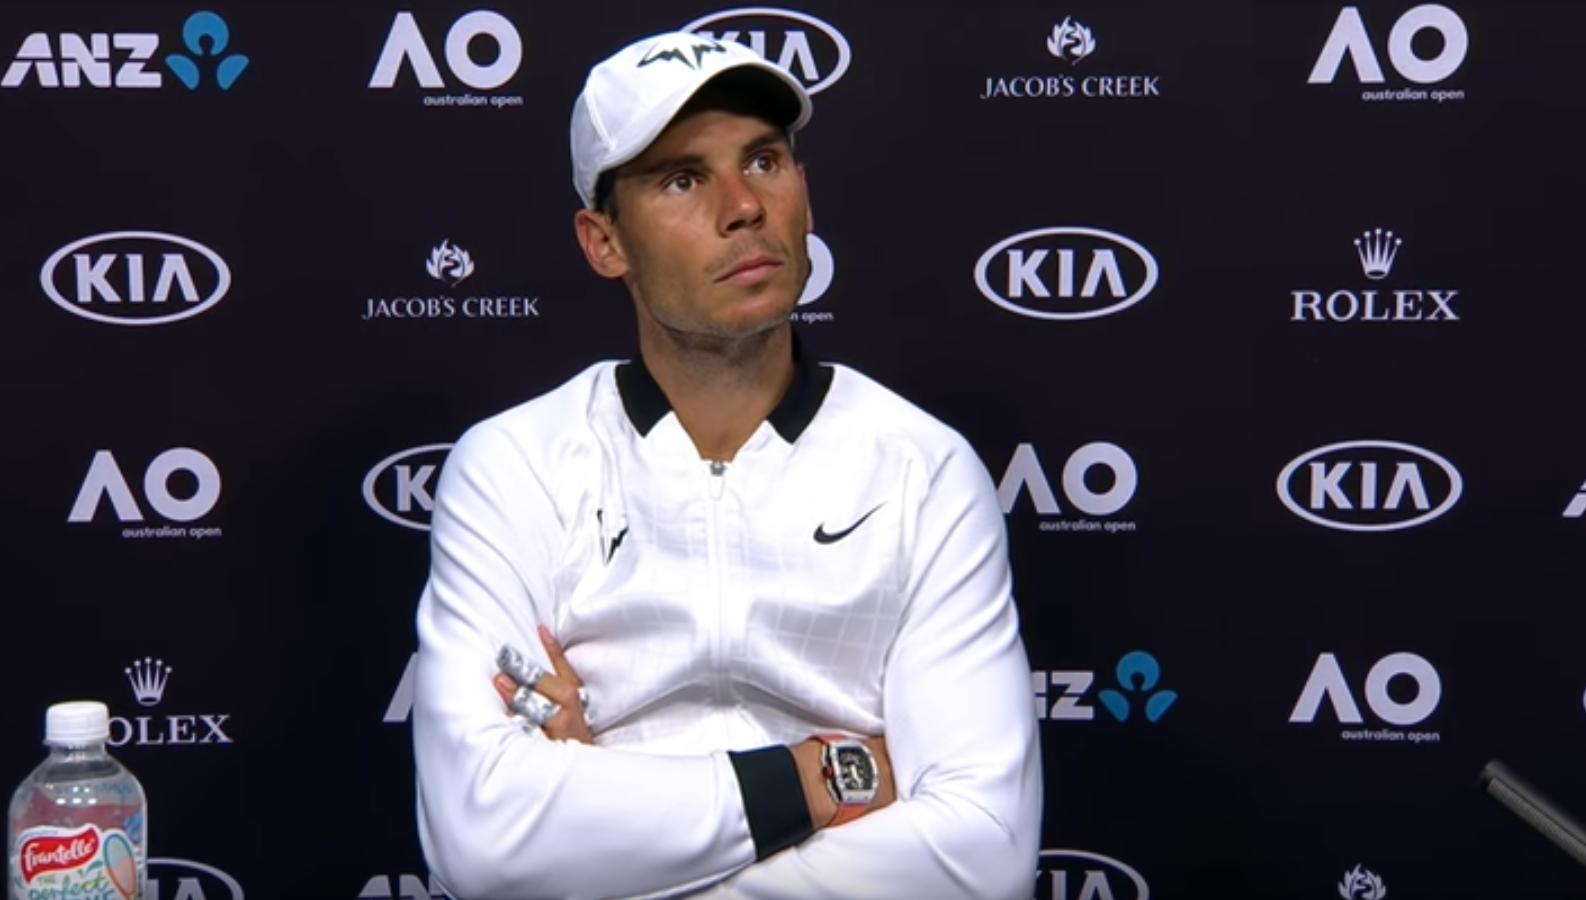 2017 Aus Open Press RM27-02 Rafa Nadal